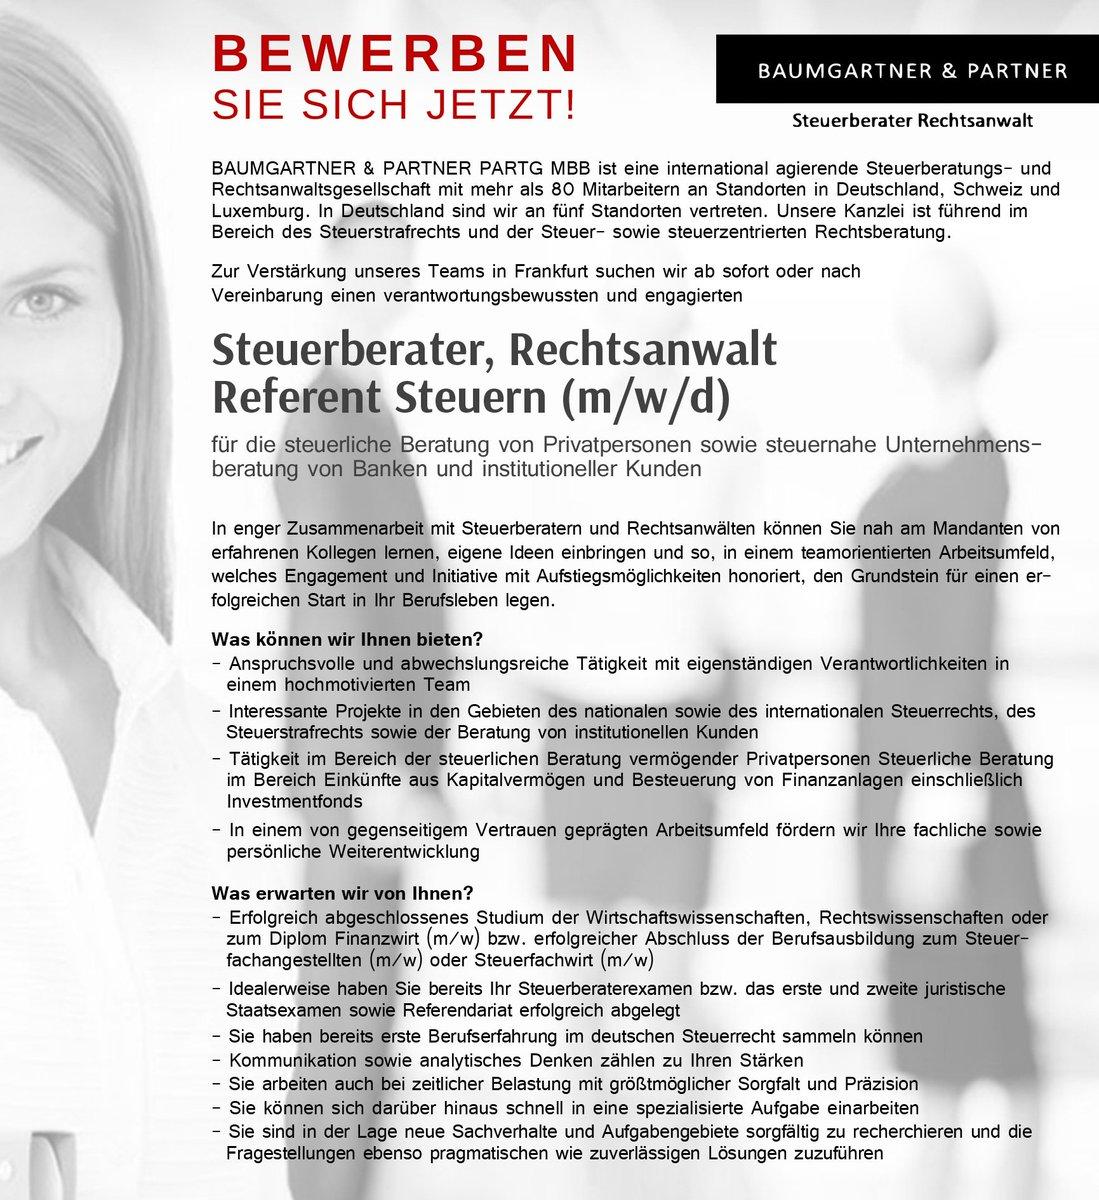 baumgartnerpartner (@tax_and_legal) | Twitter